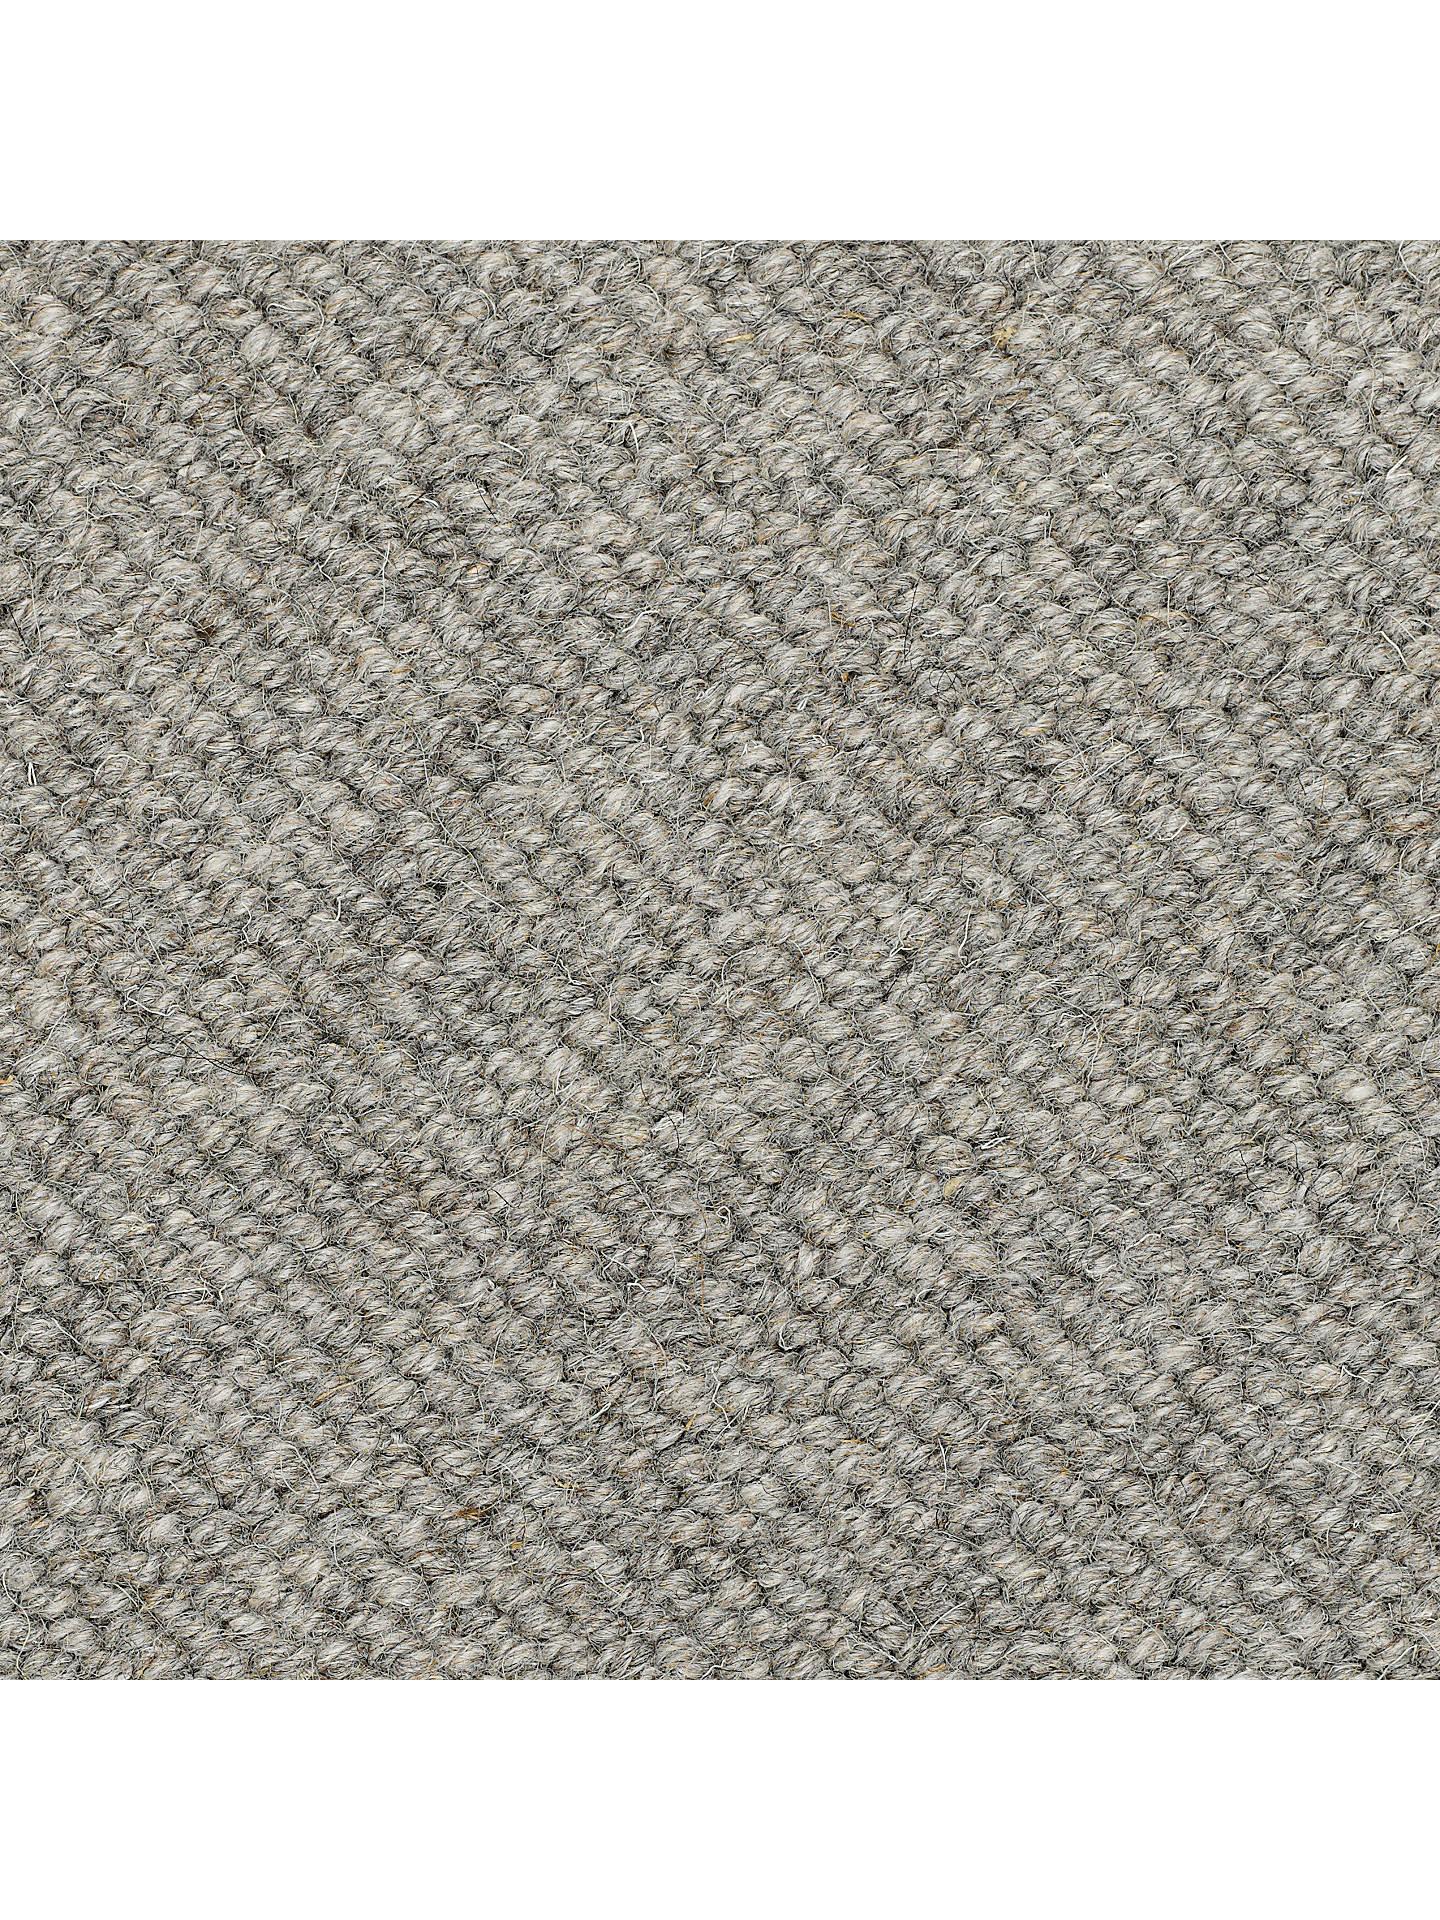 john lewis partners rustic cable 4 ply wool loop carpet. Black Bedroom Furniture Sets. Home Design Ideas